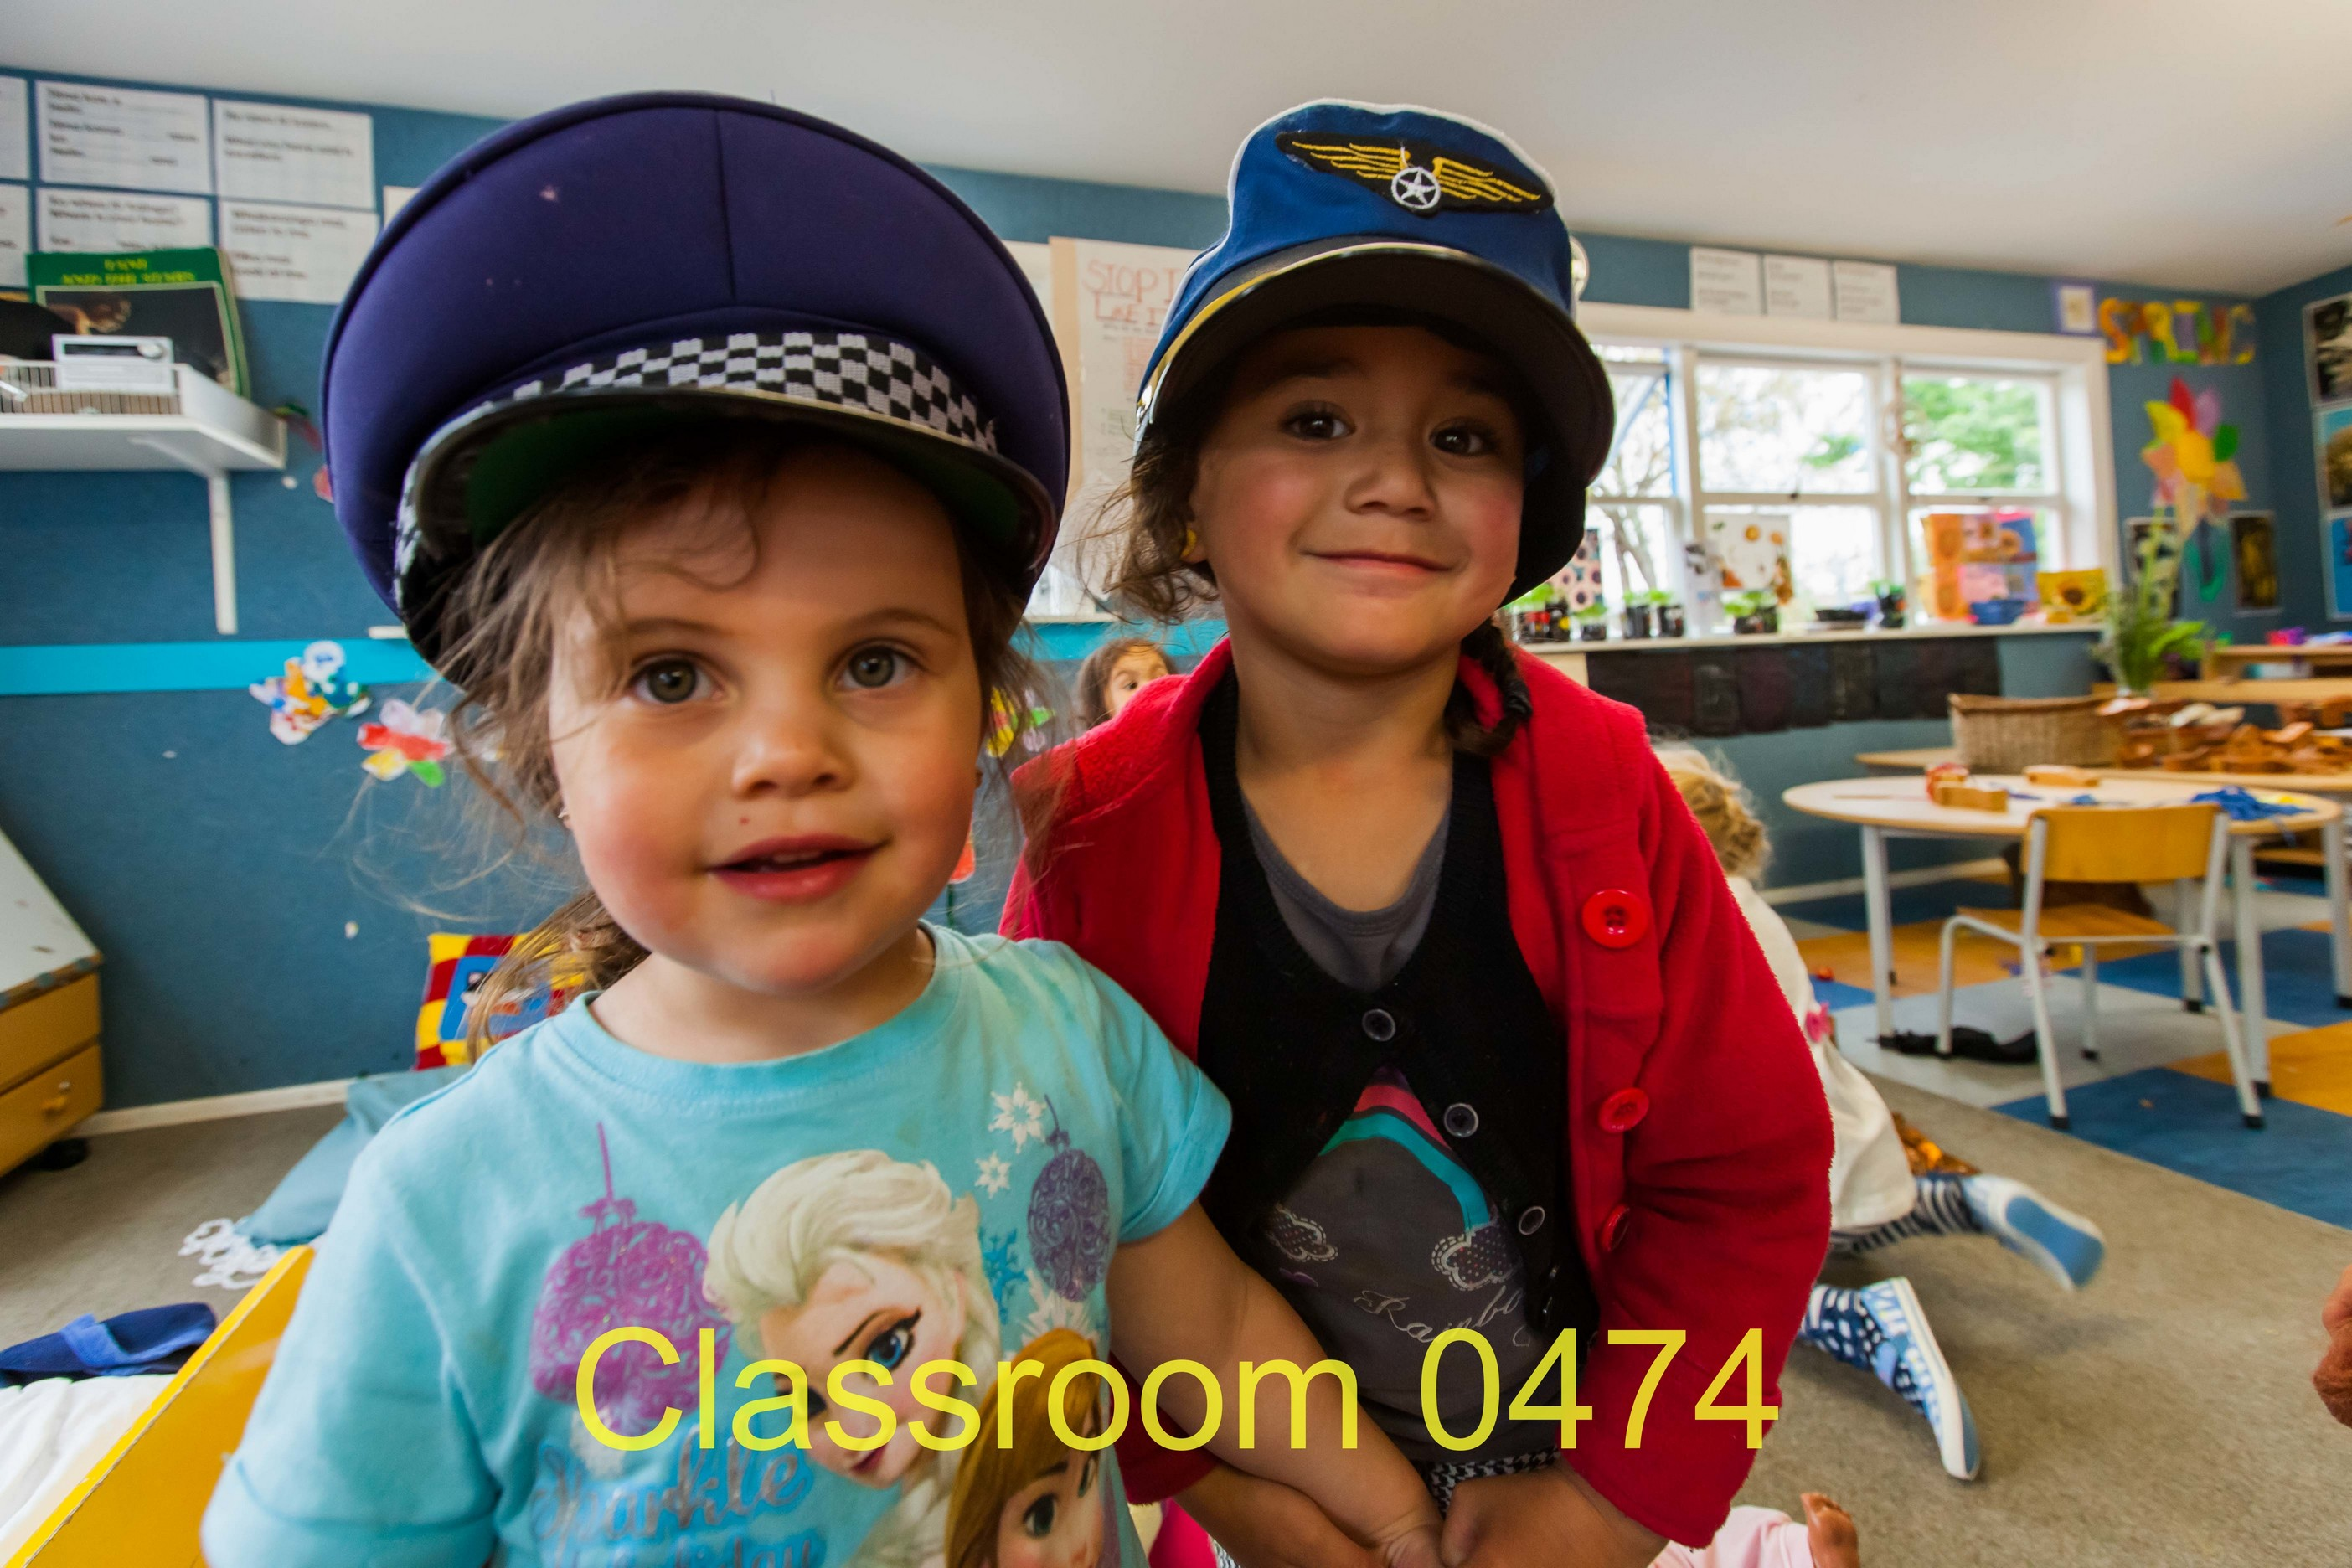 Classroom 0474